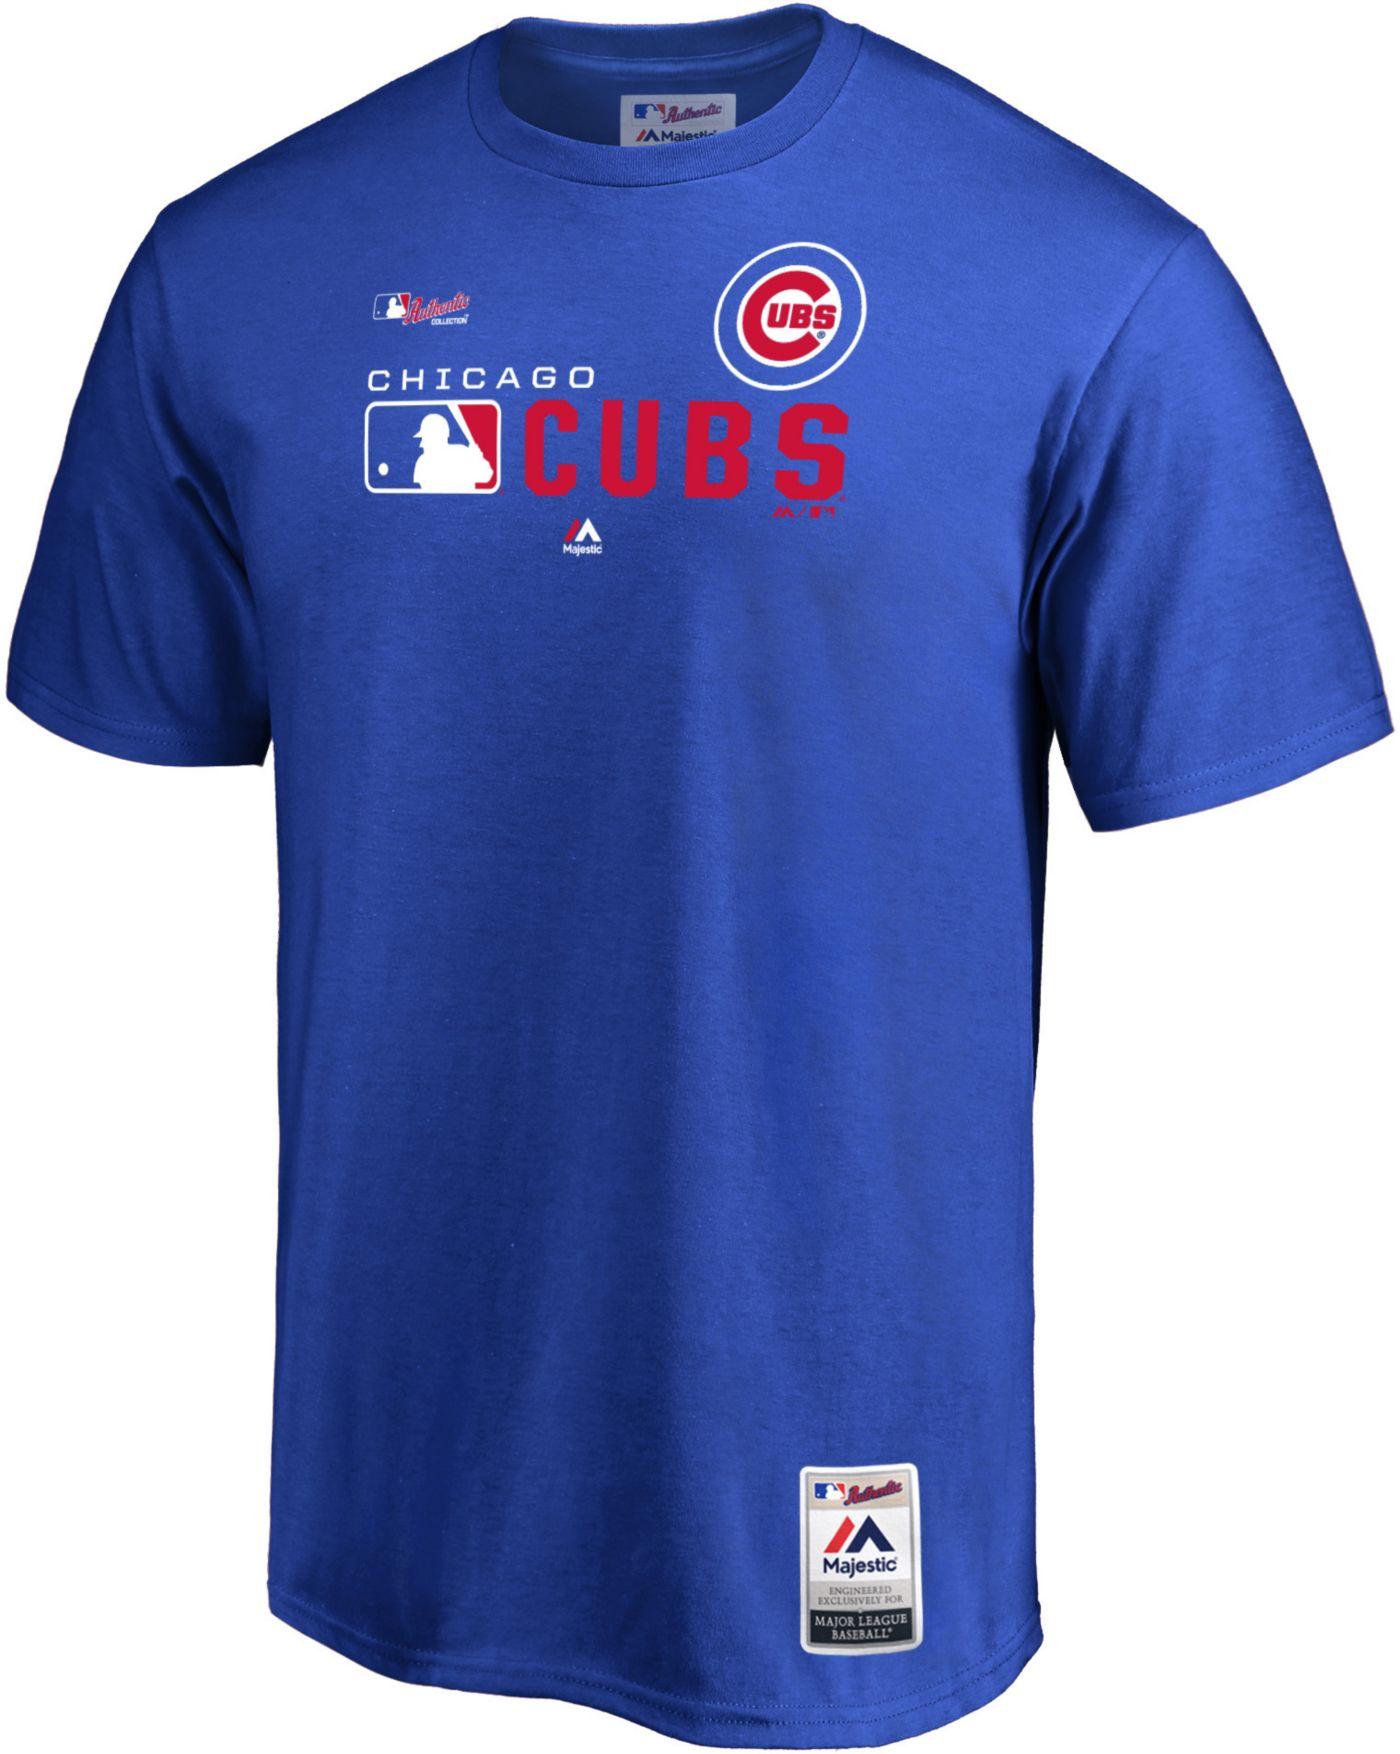 Majestic Men's Chicago Cubs Authentic Collection T-Shirt